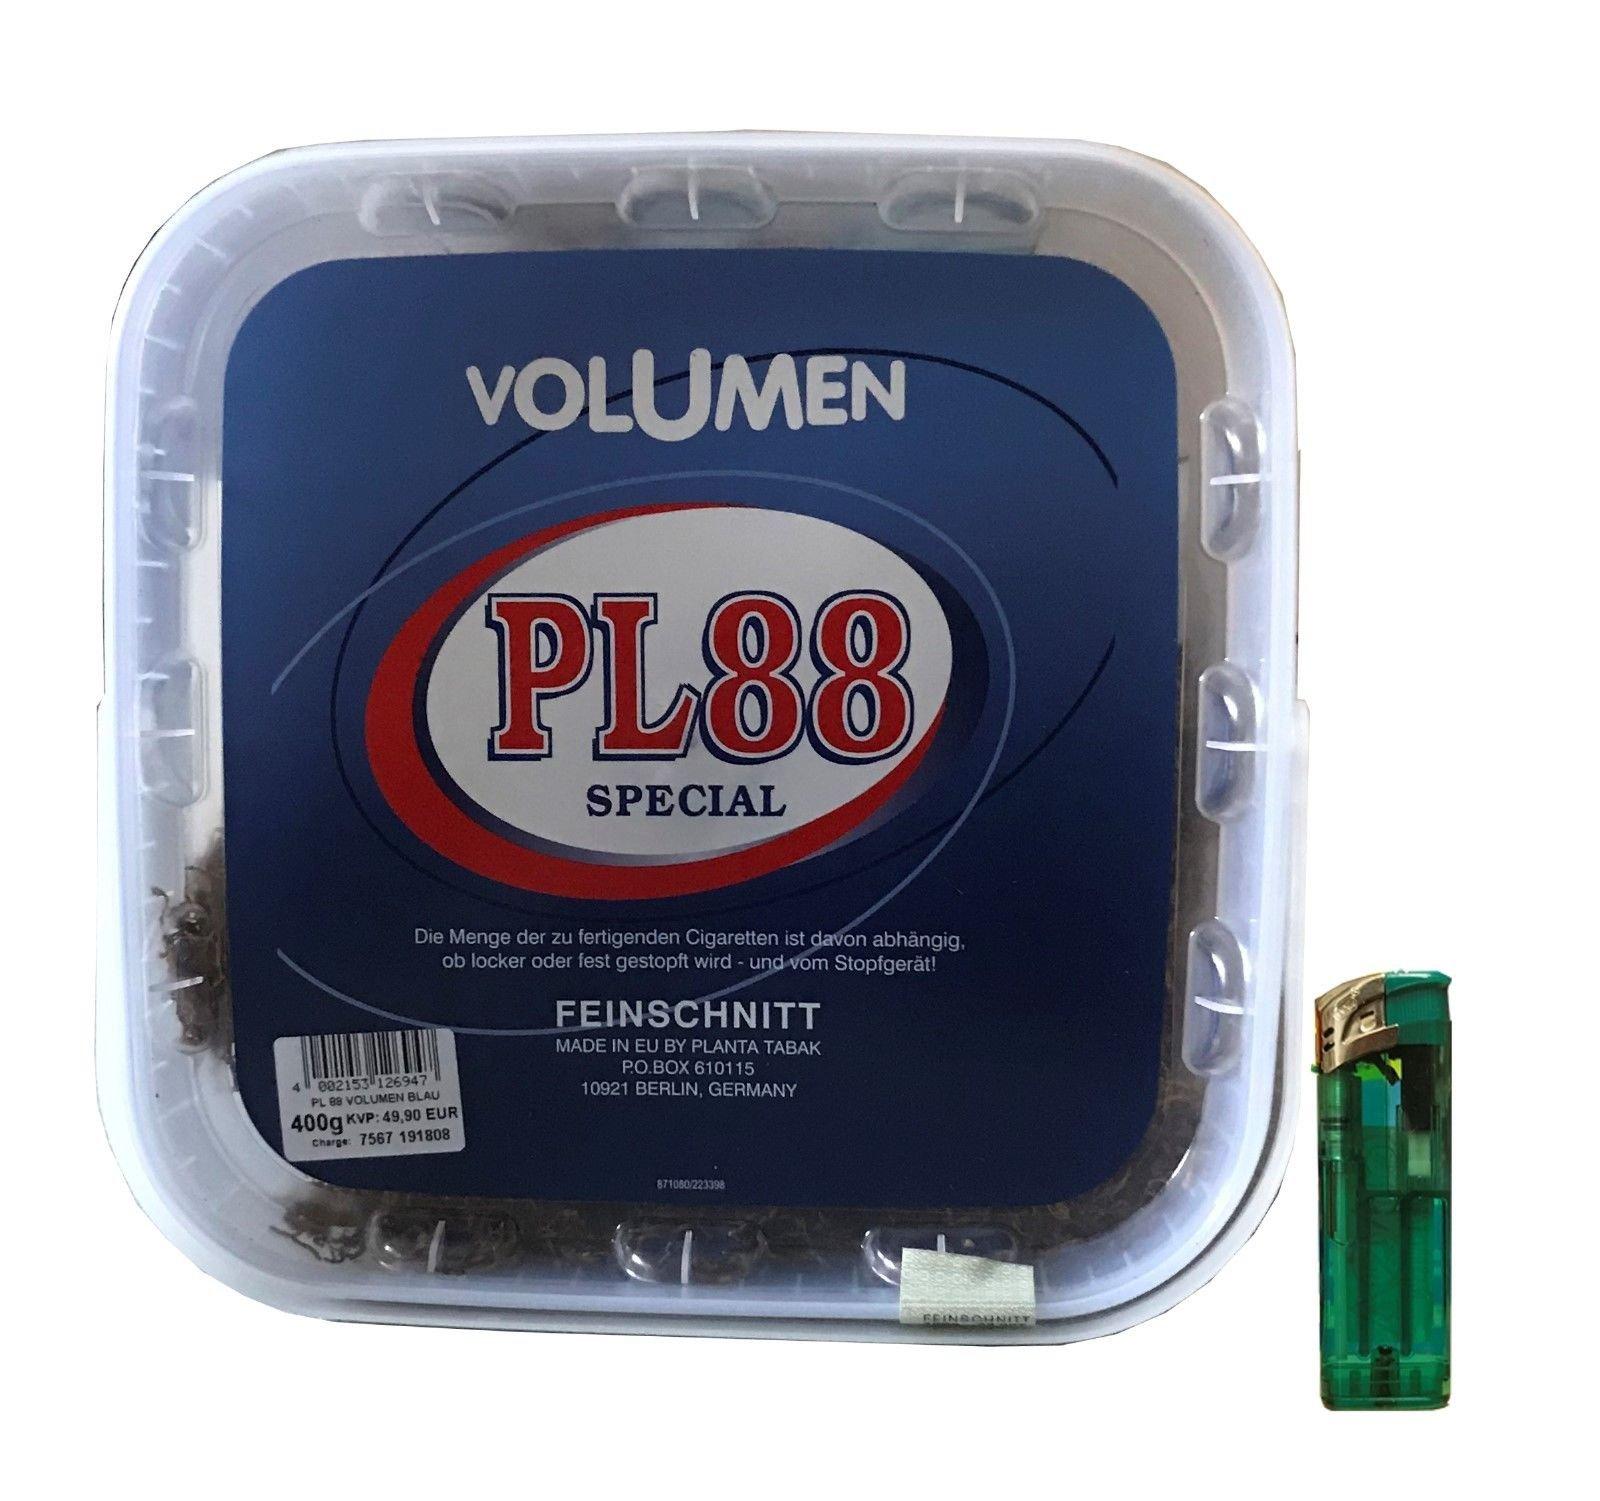 1x PL88 Special Blau Tabak / Volumentabak 400g + Feuerzeug